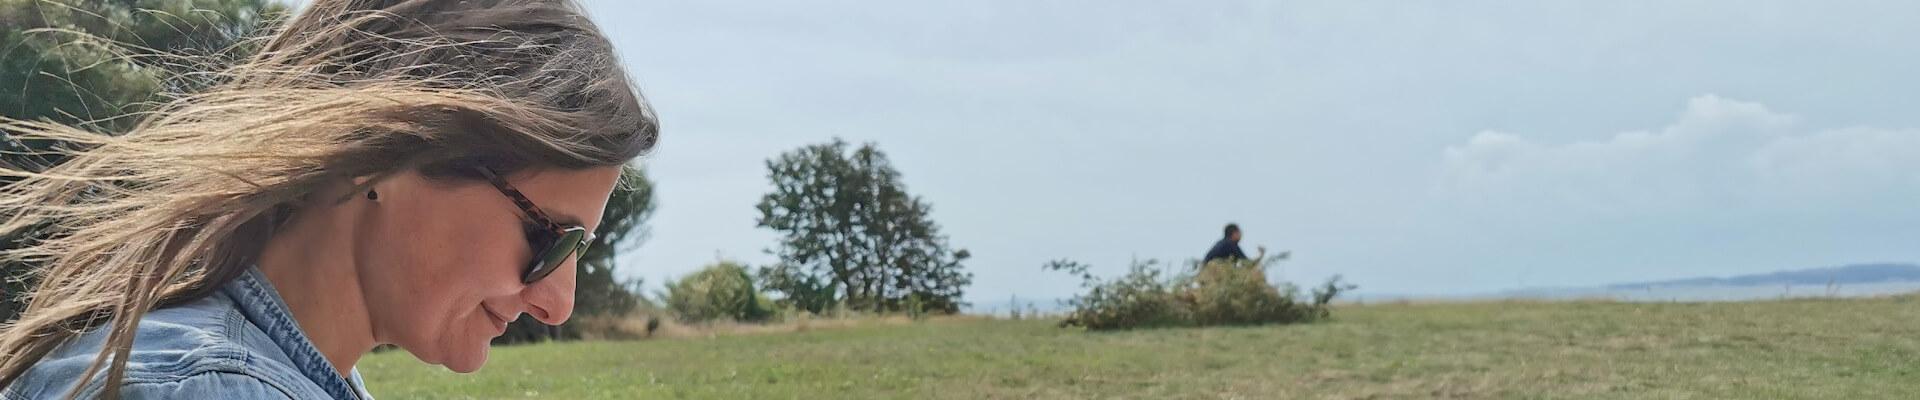 Naturforsamlingshus - Growing leadership top